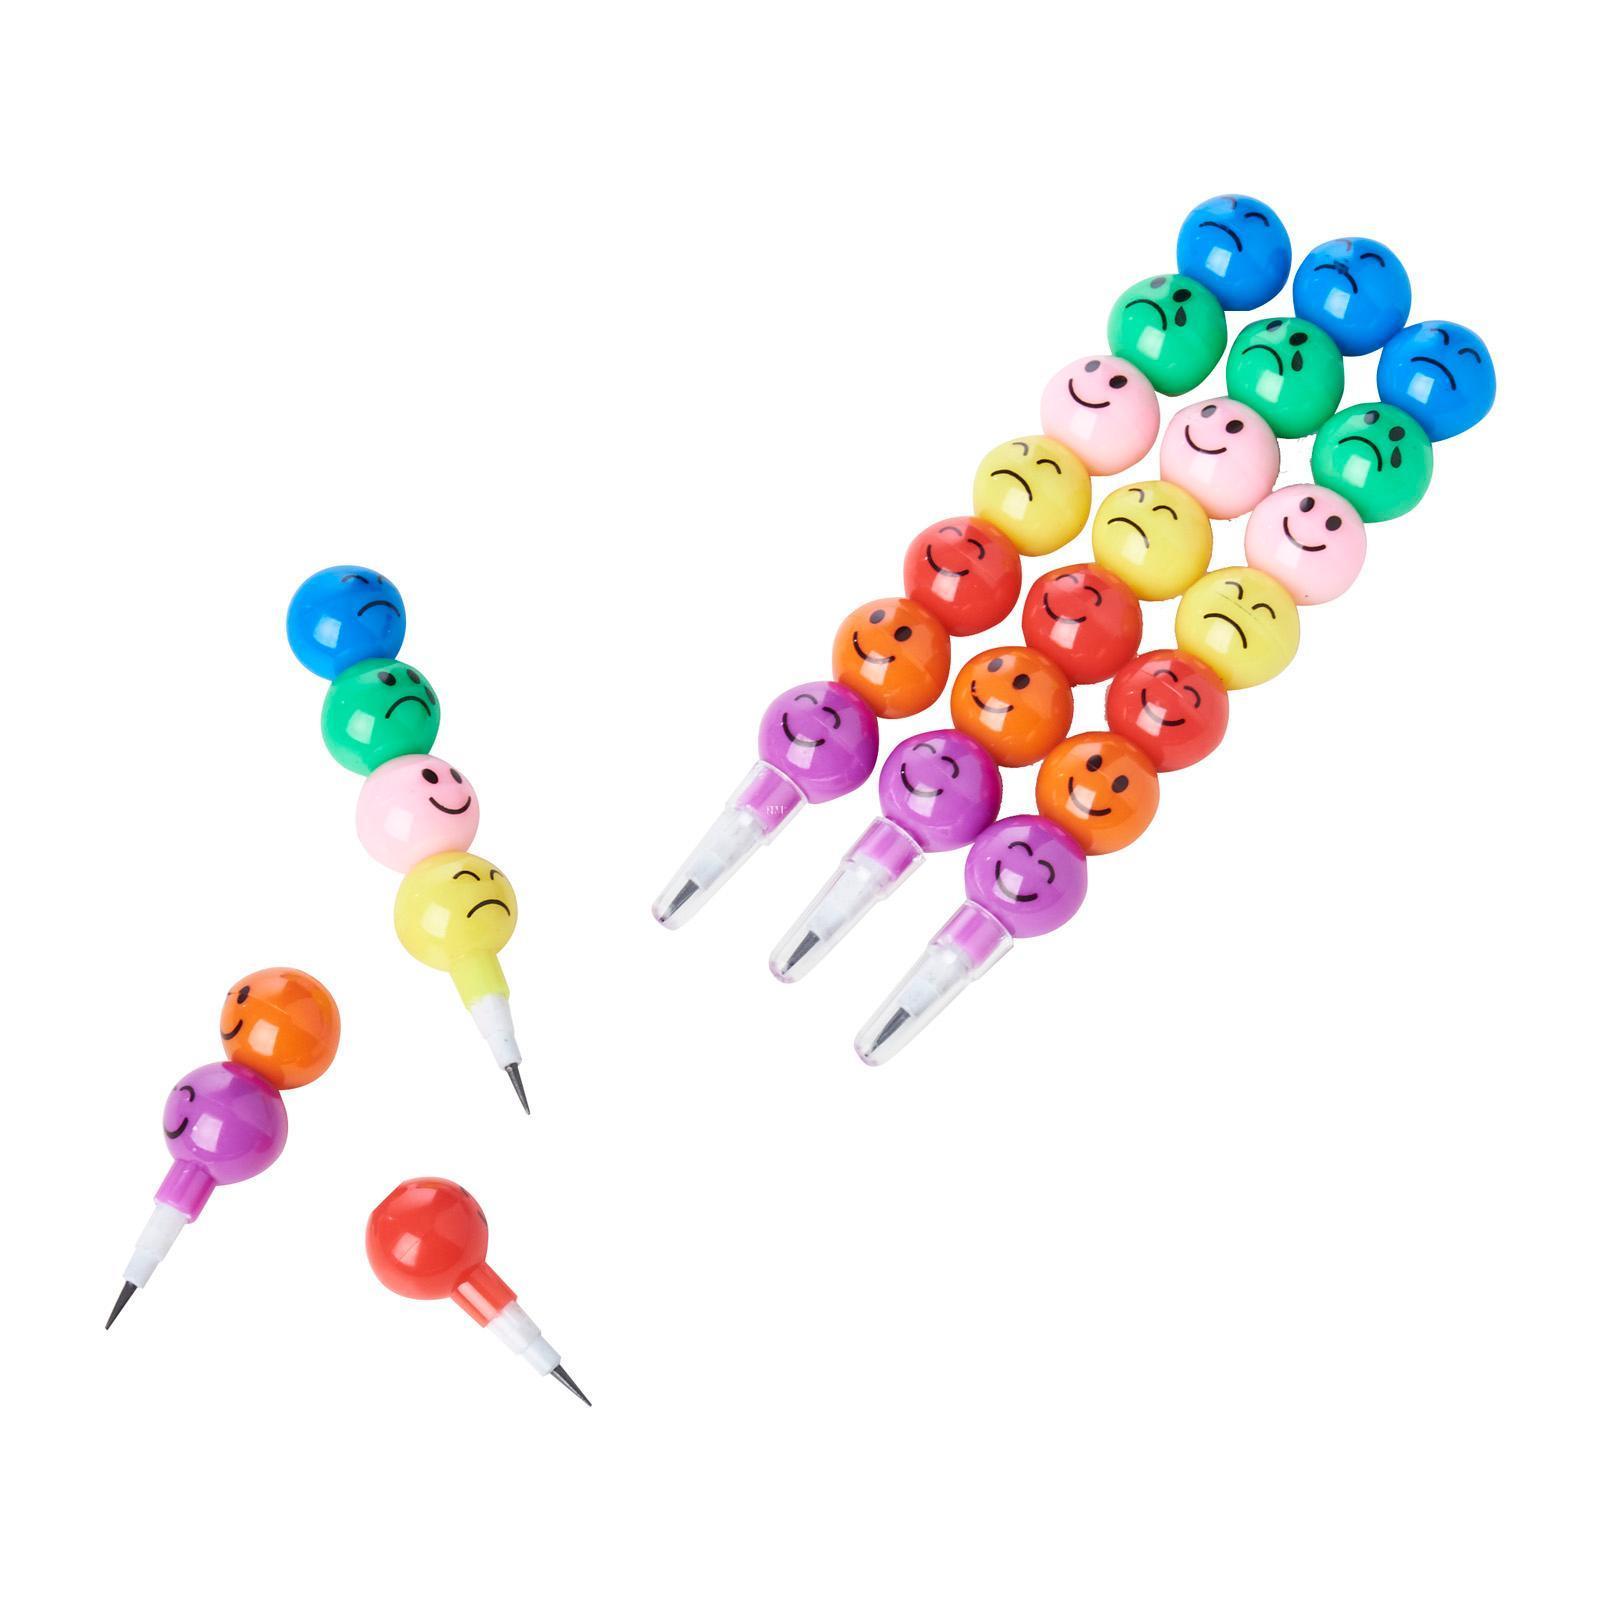 CGS Interchangeble Smiley Face Pencil (4pcs)